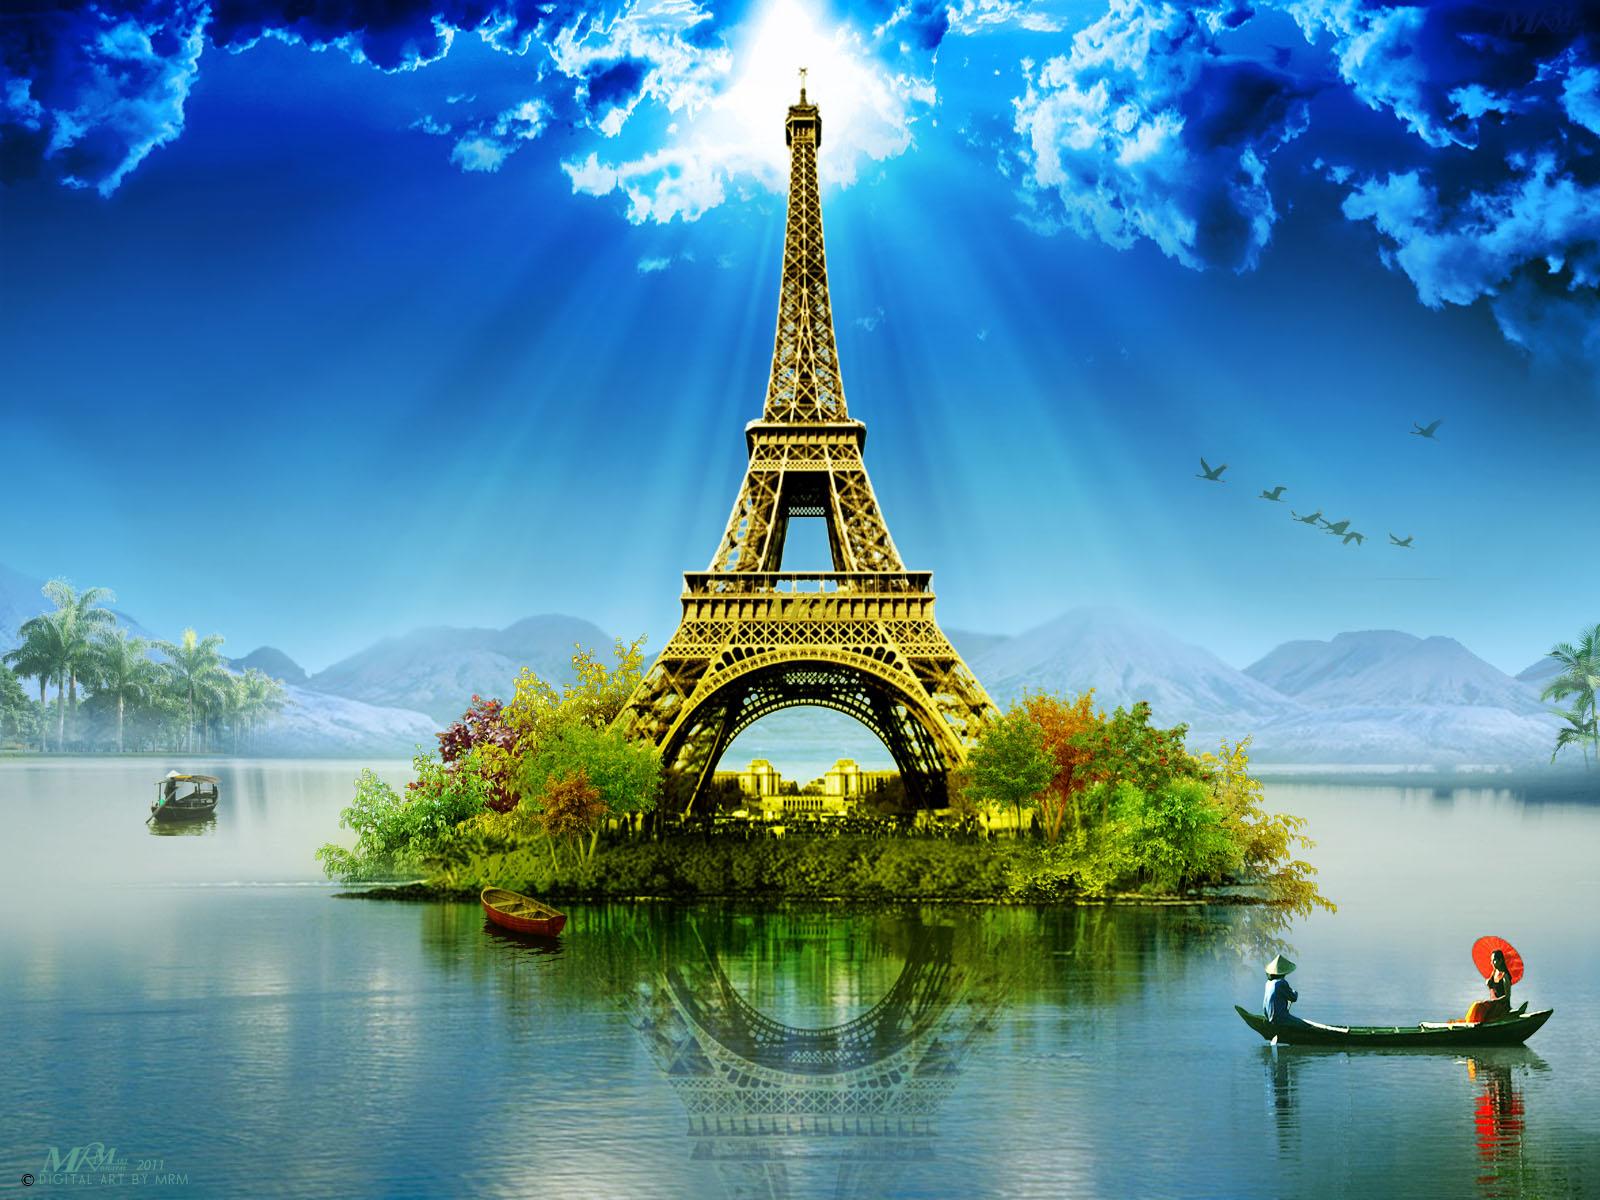 3d Wallpaper Custom Photo Hd Art Photography City: PZ C: Eiffel Tower Wallpaper